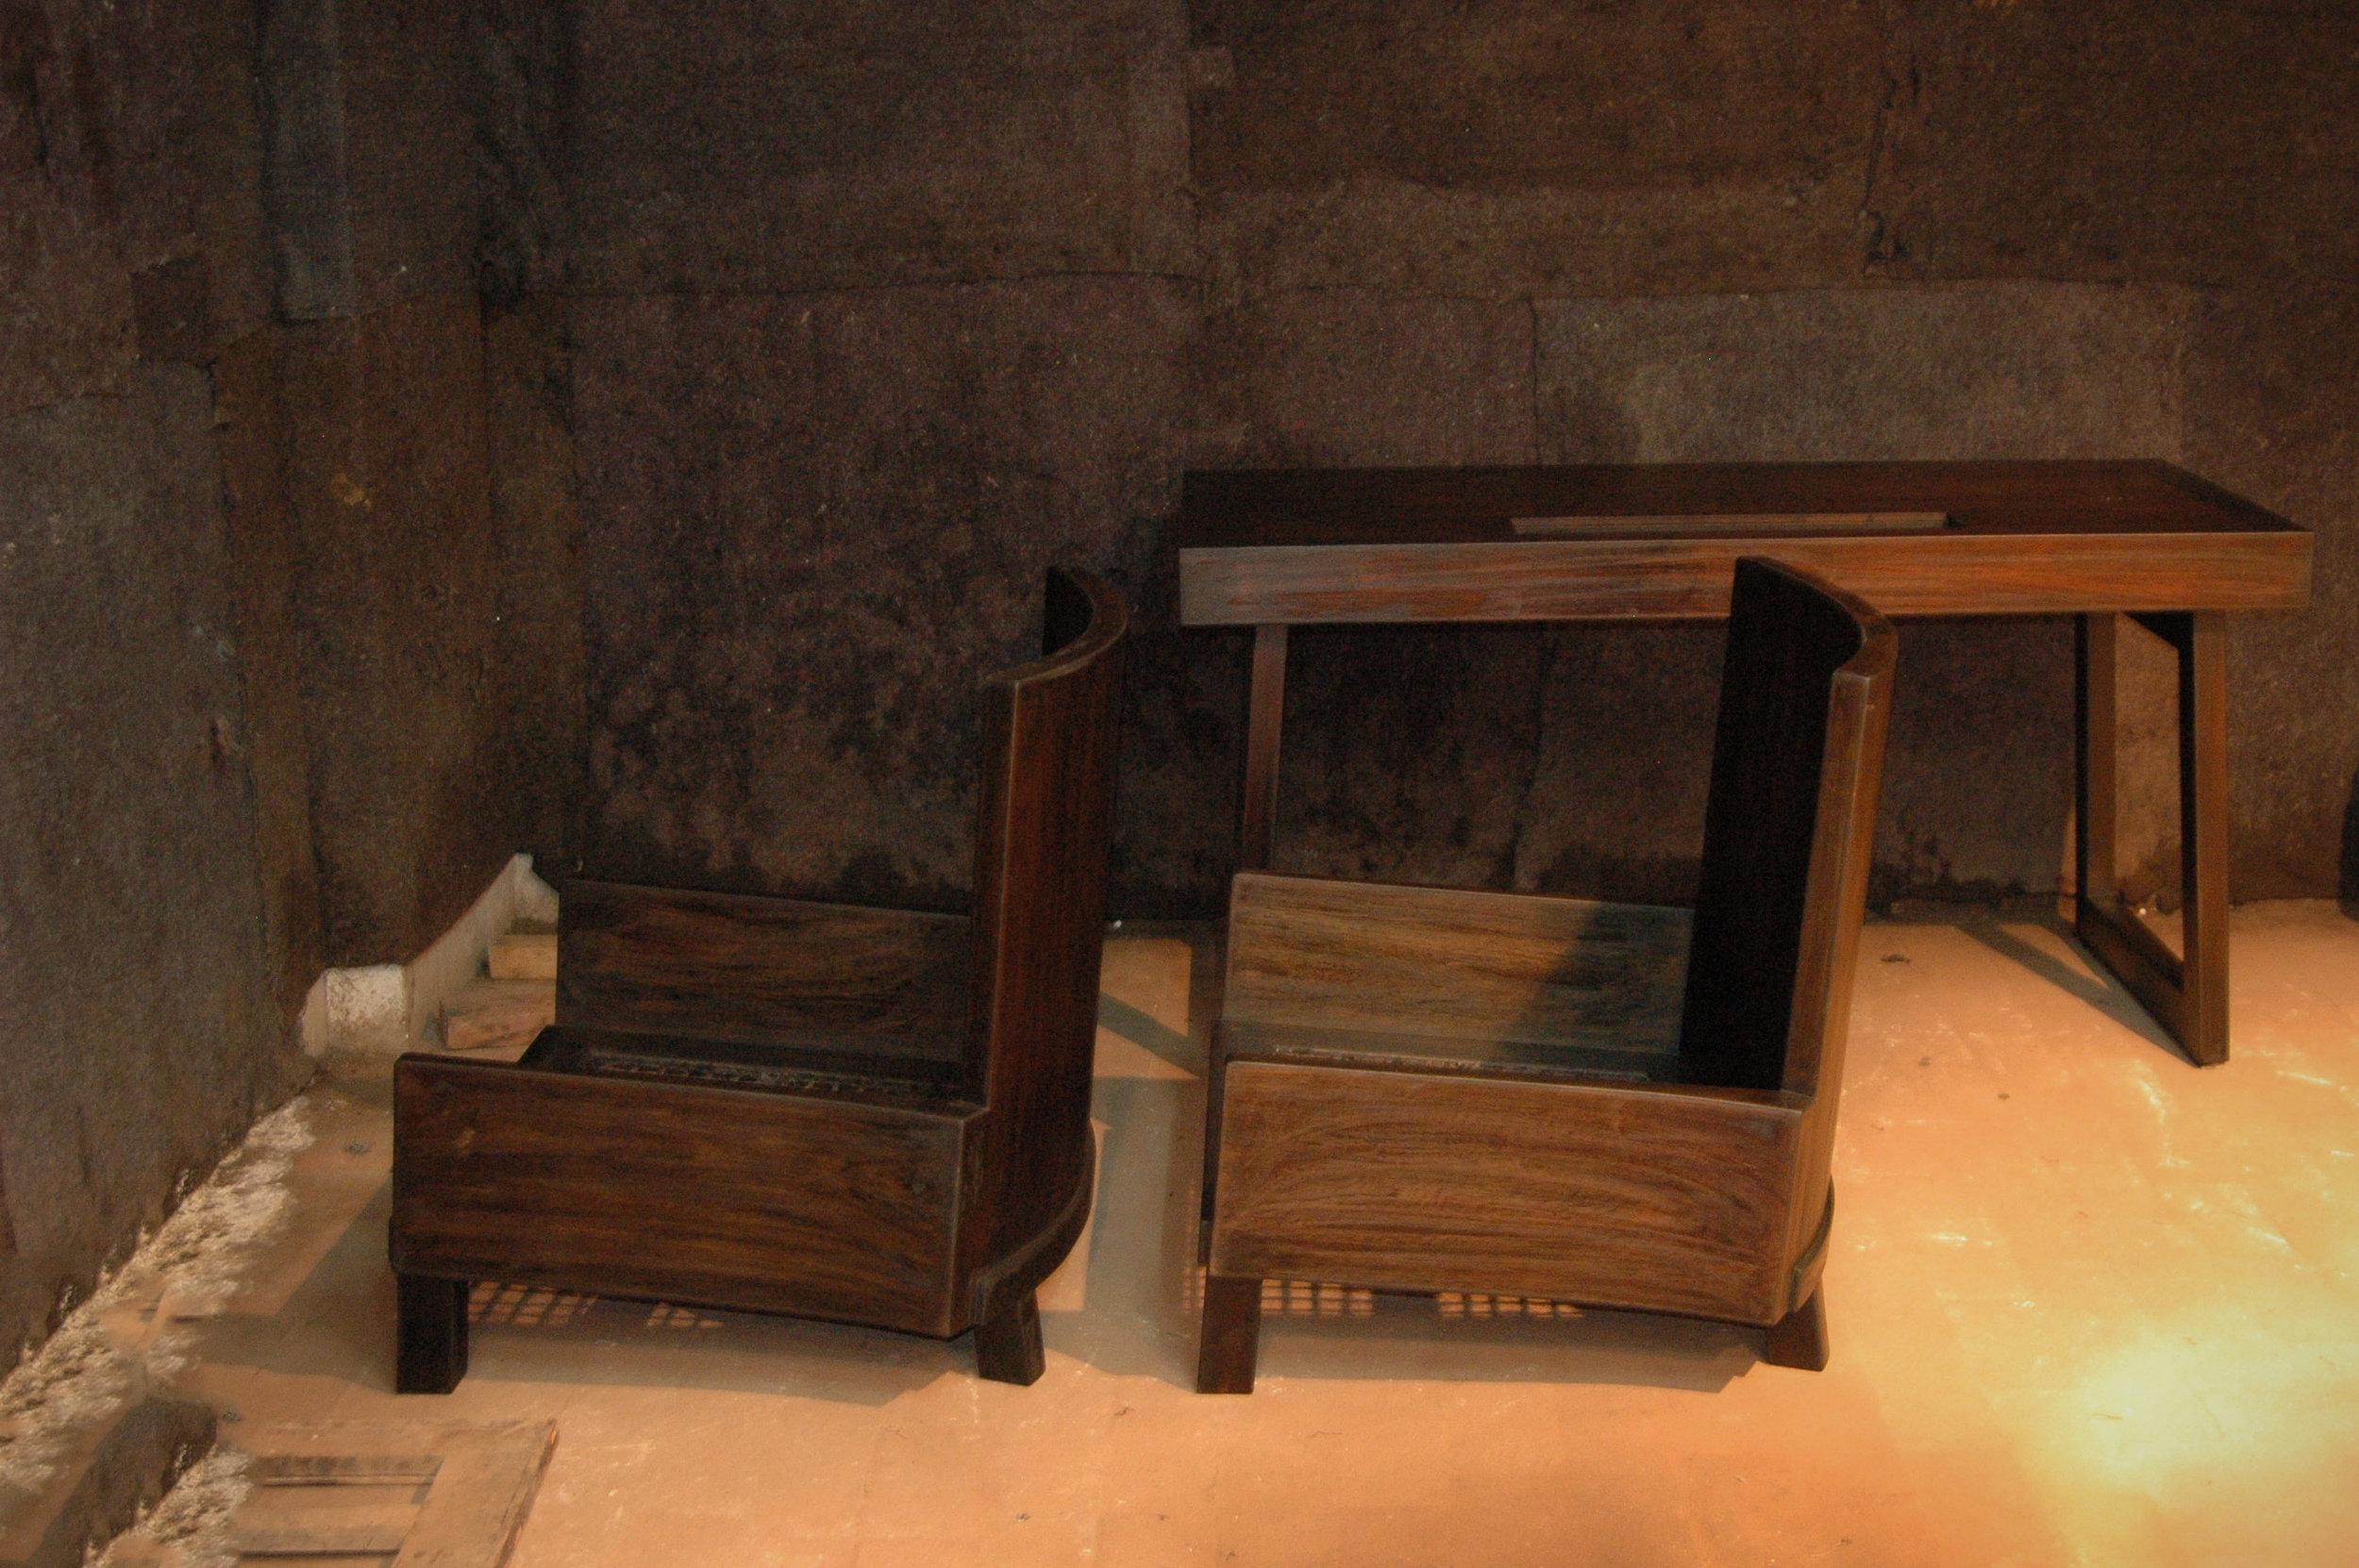 ....bespoke furniture : artisan crafting photos ..特别定制家具 : 公丈制作照片....